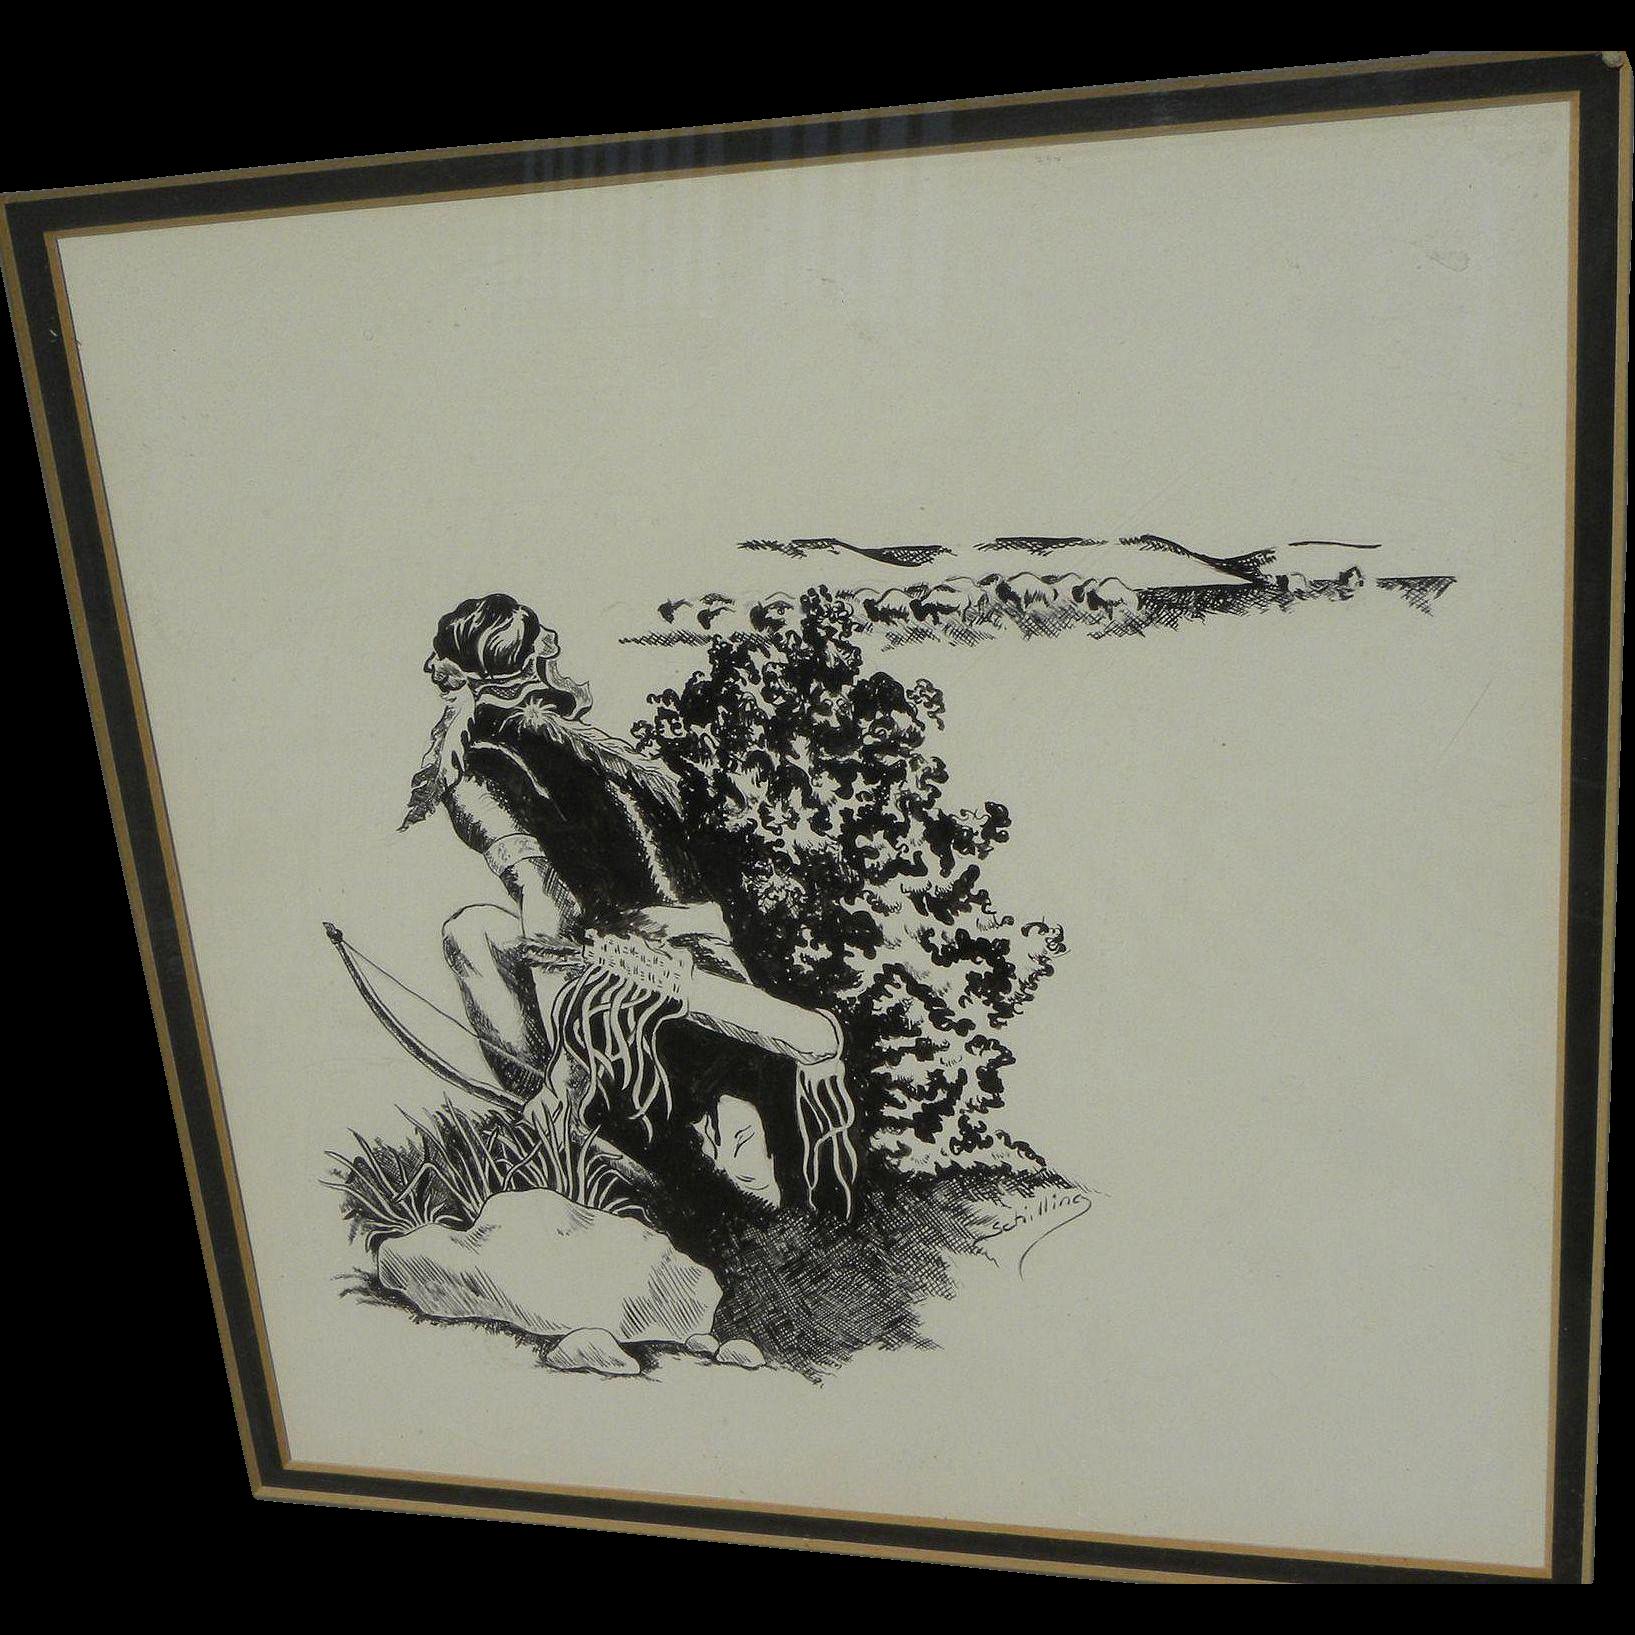 Vintage ink drawing of Native American Indian hunting bison signed Schilling